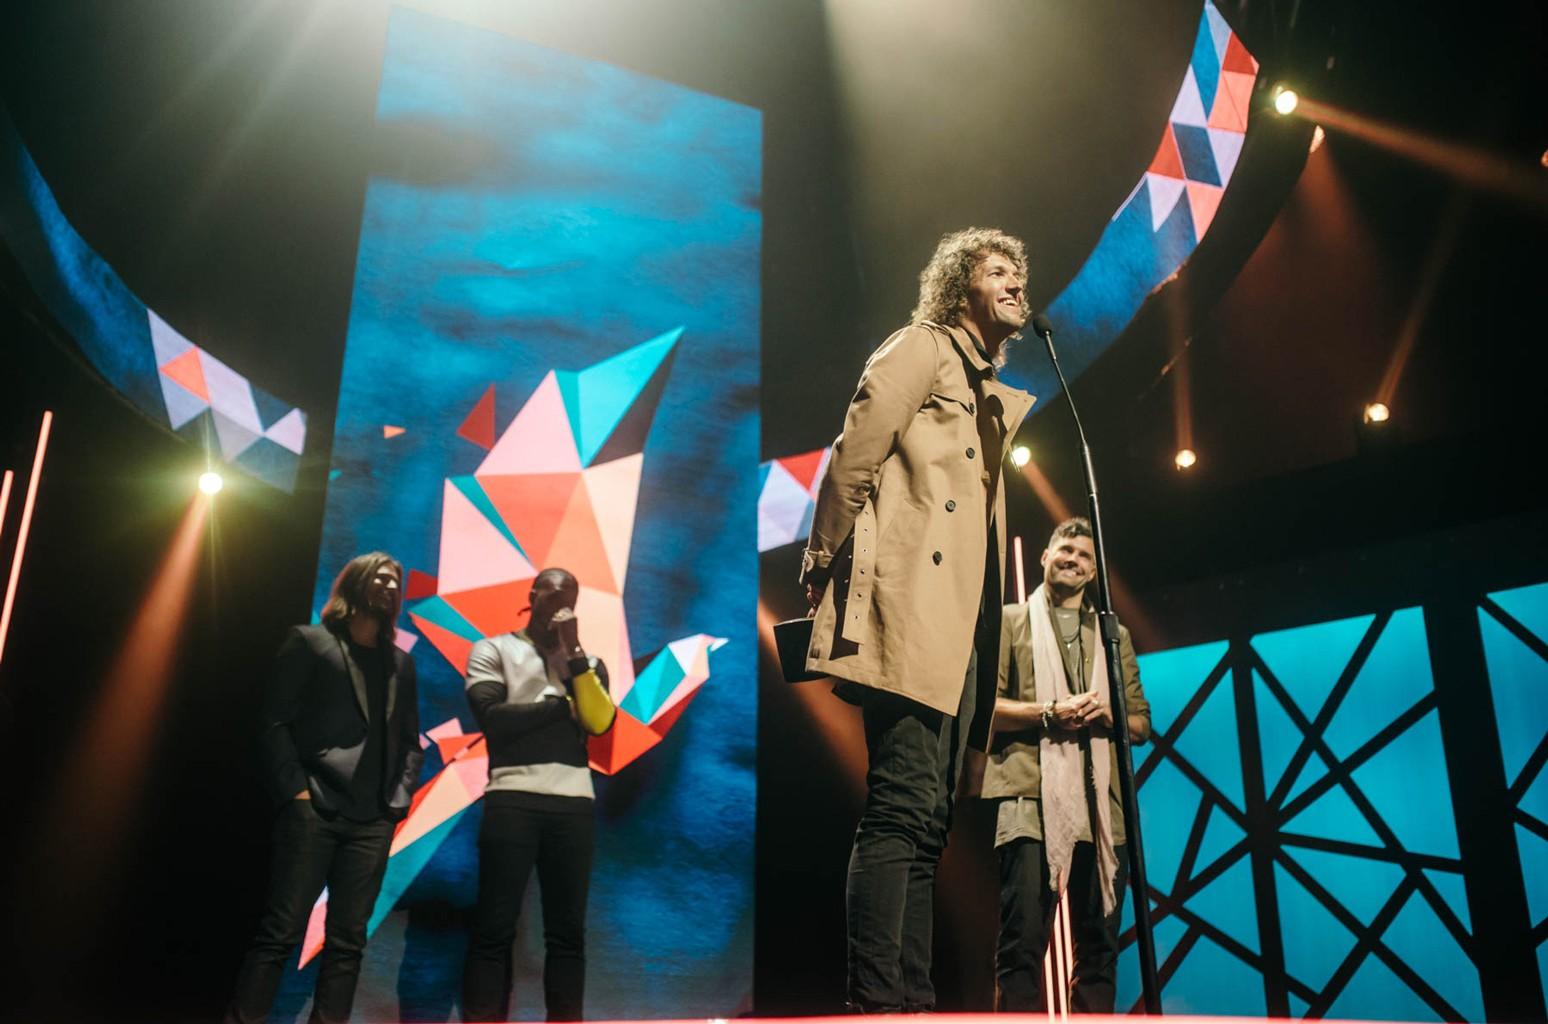 for King & Country, CeCe Winans, We the Kingdom, KB & Jason Ingram Among GMA Dove Awards Winners